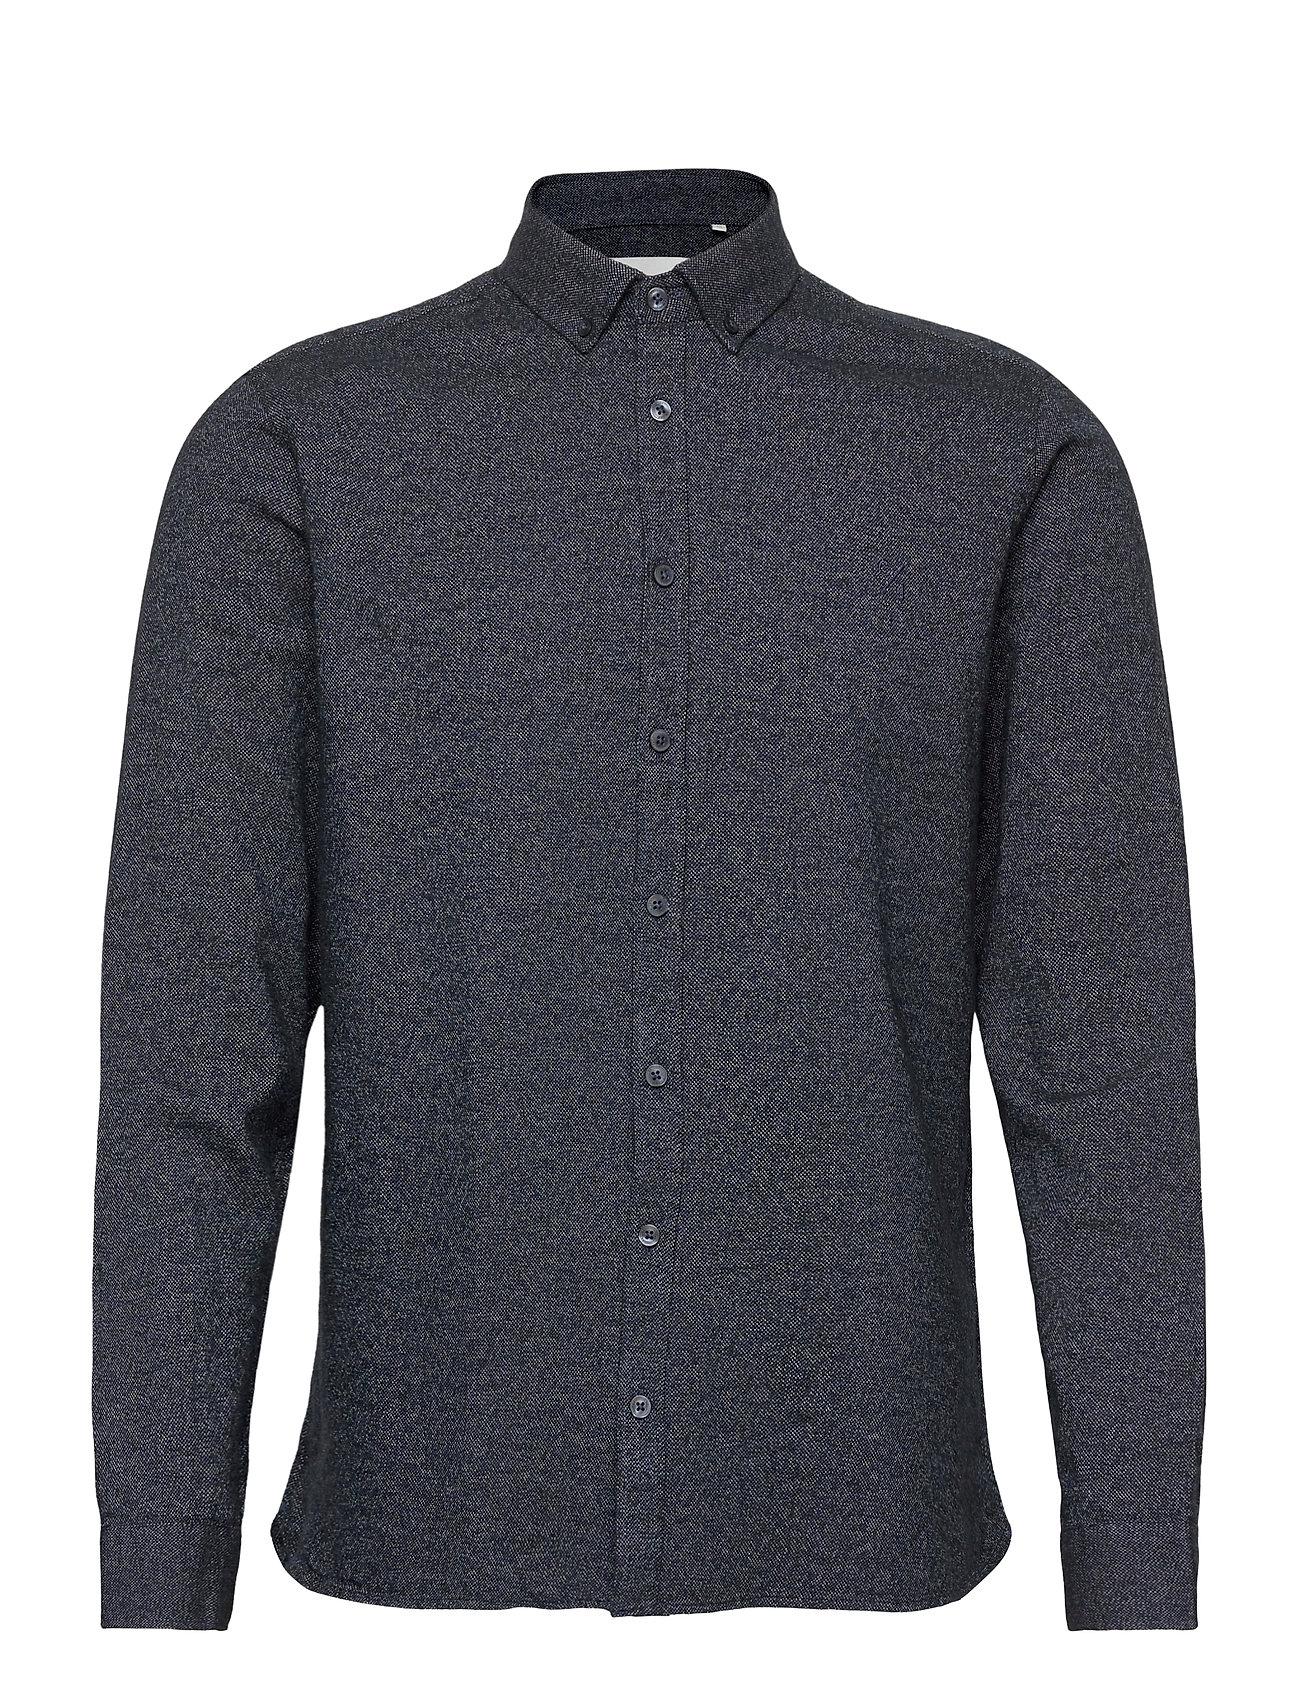 Image of Anton Bd Ls Shirt Skjorte Casual Blå Casual Friday (3445900155)